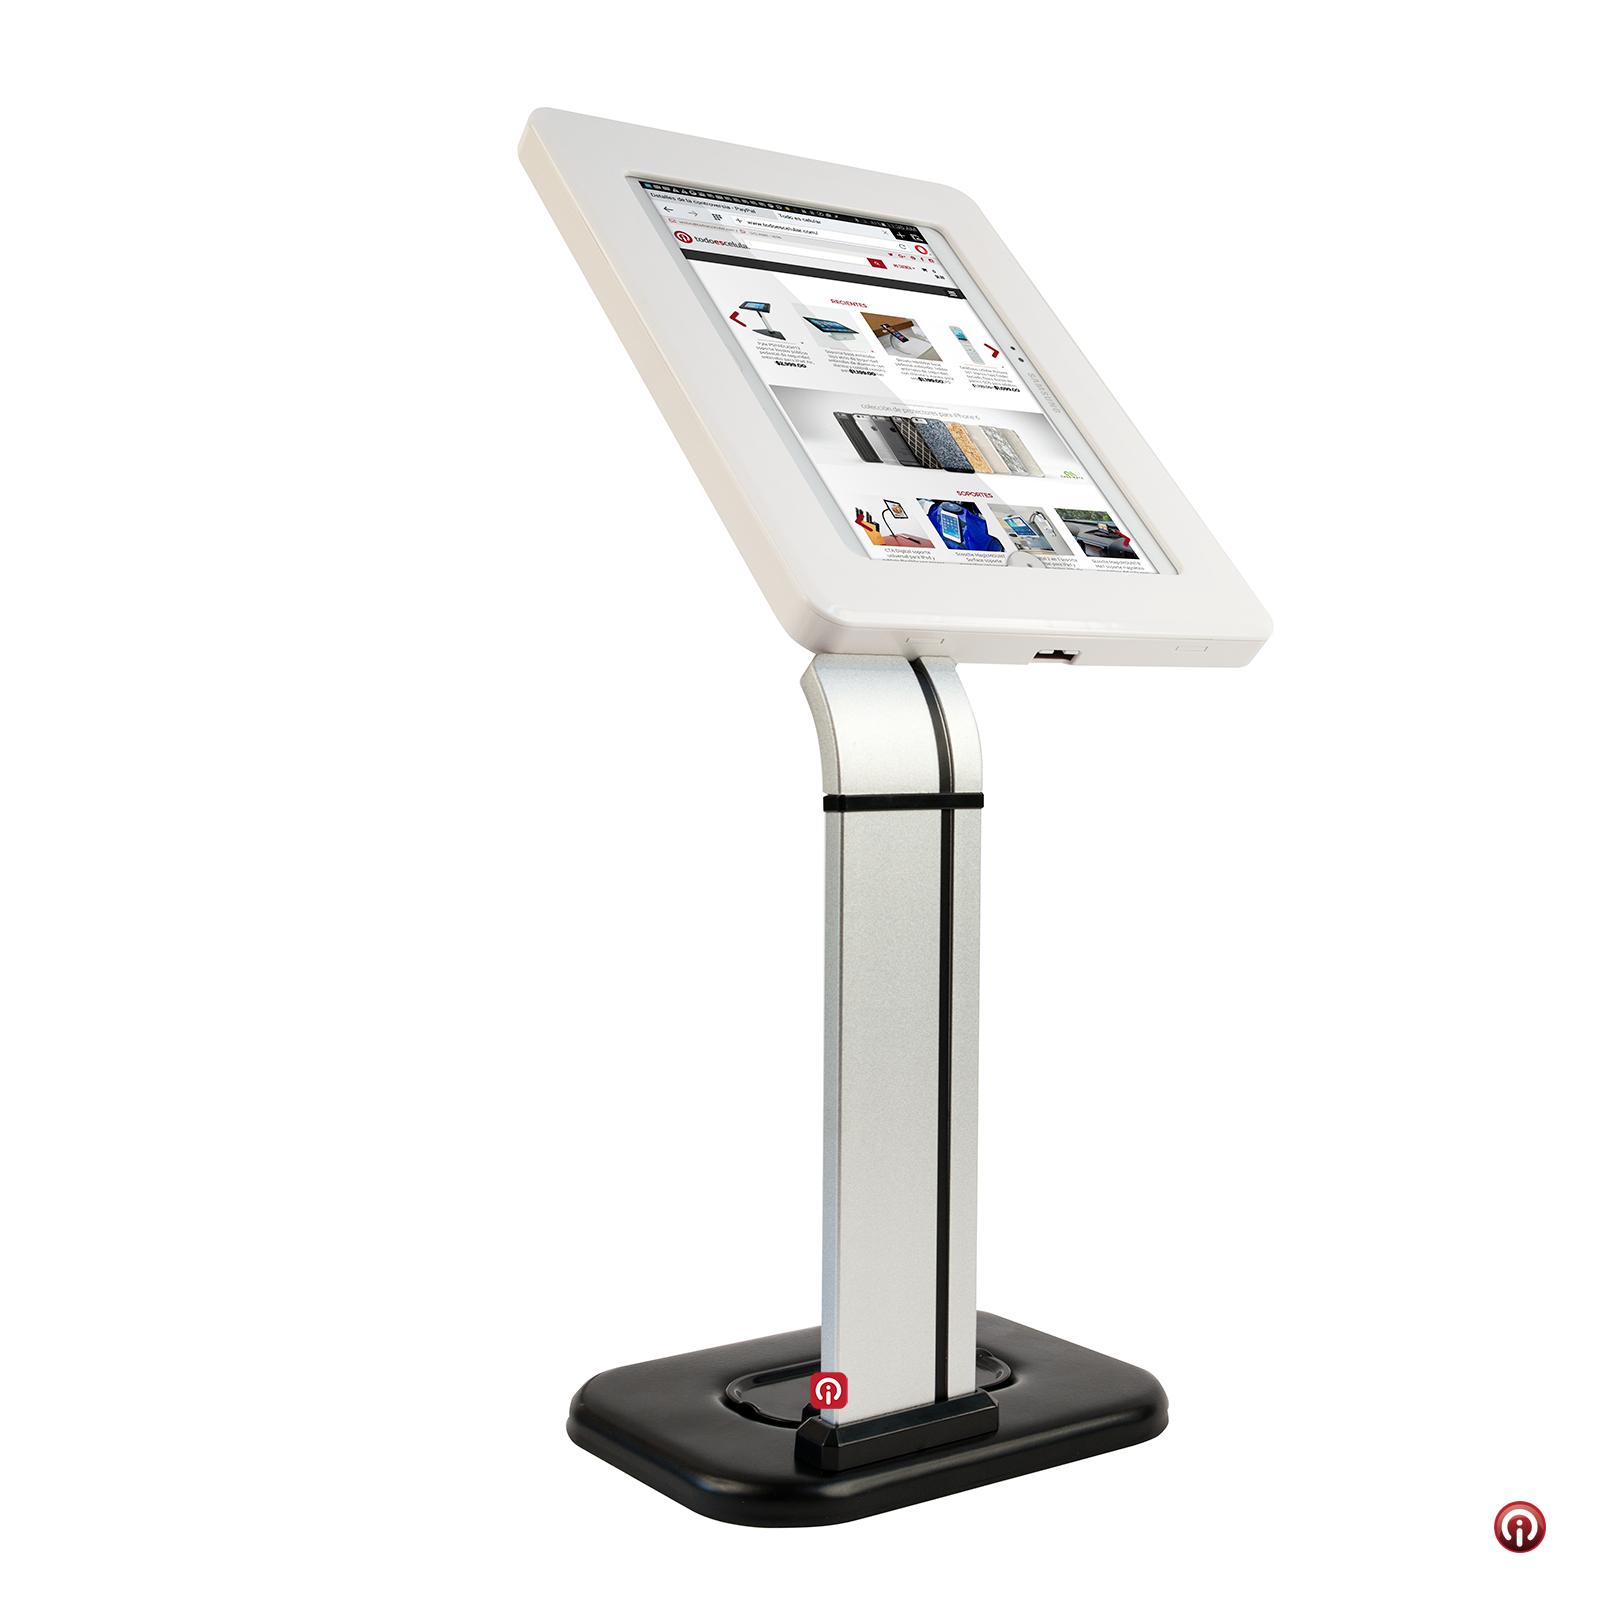 Tsclk14 soporte base kiosko pedestal universal seguridad for Soporte tablet pared